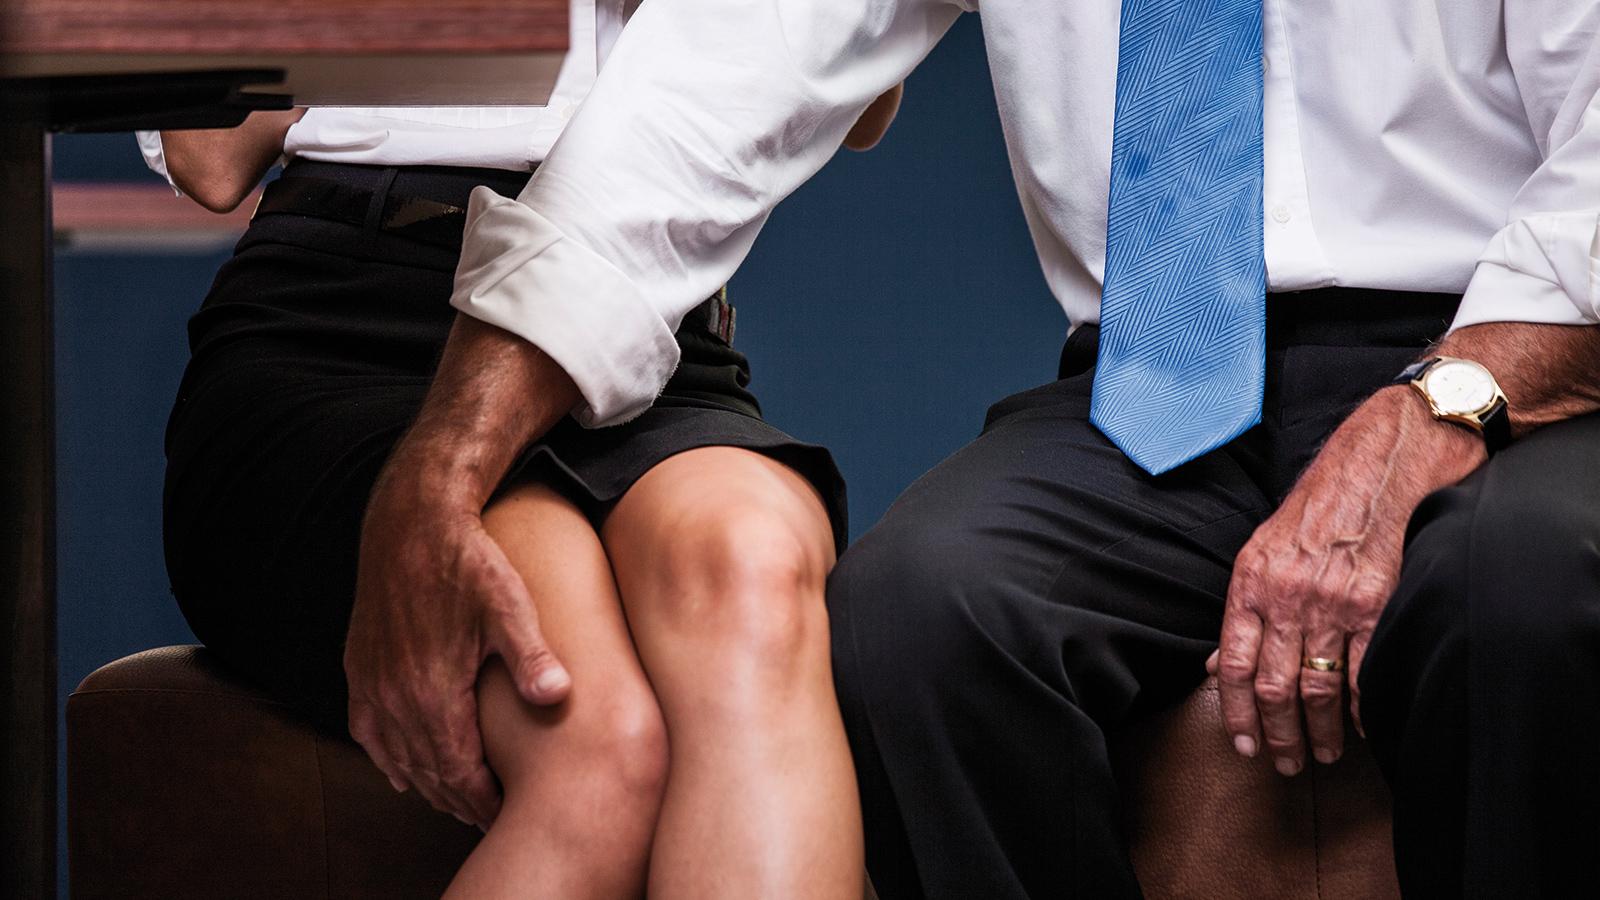 Femmes-harcelement-sexuel-